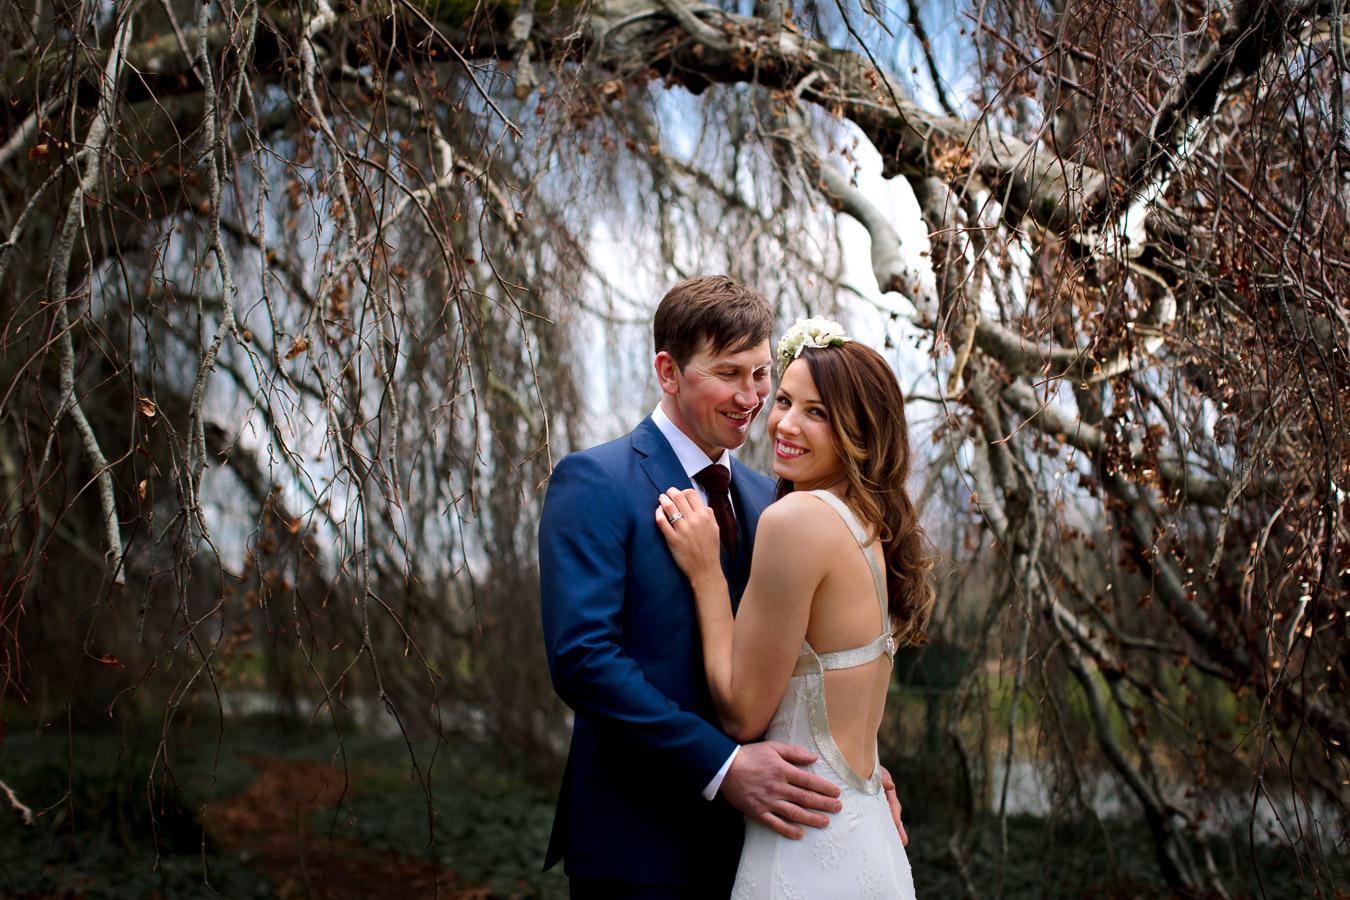 adare manor wedding photography